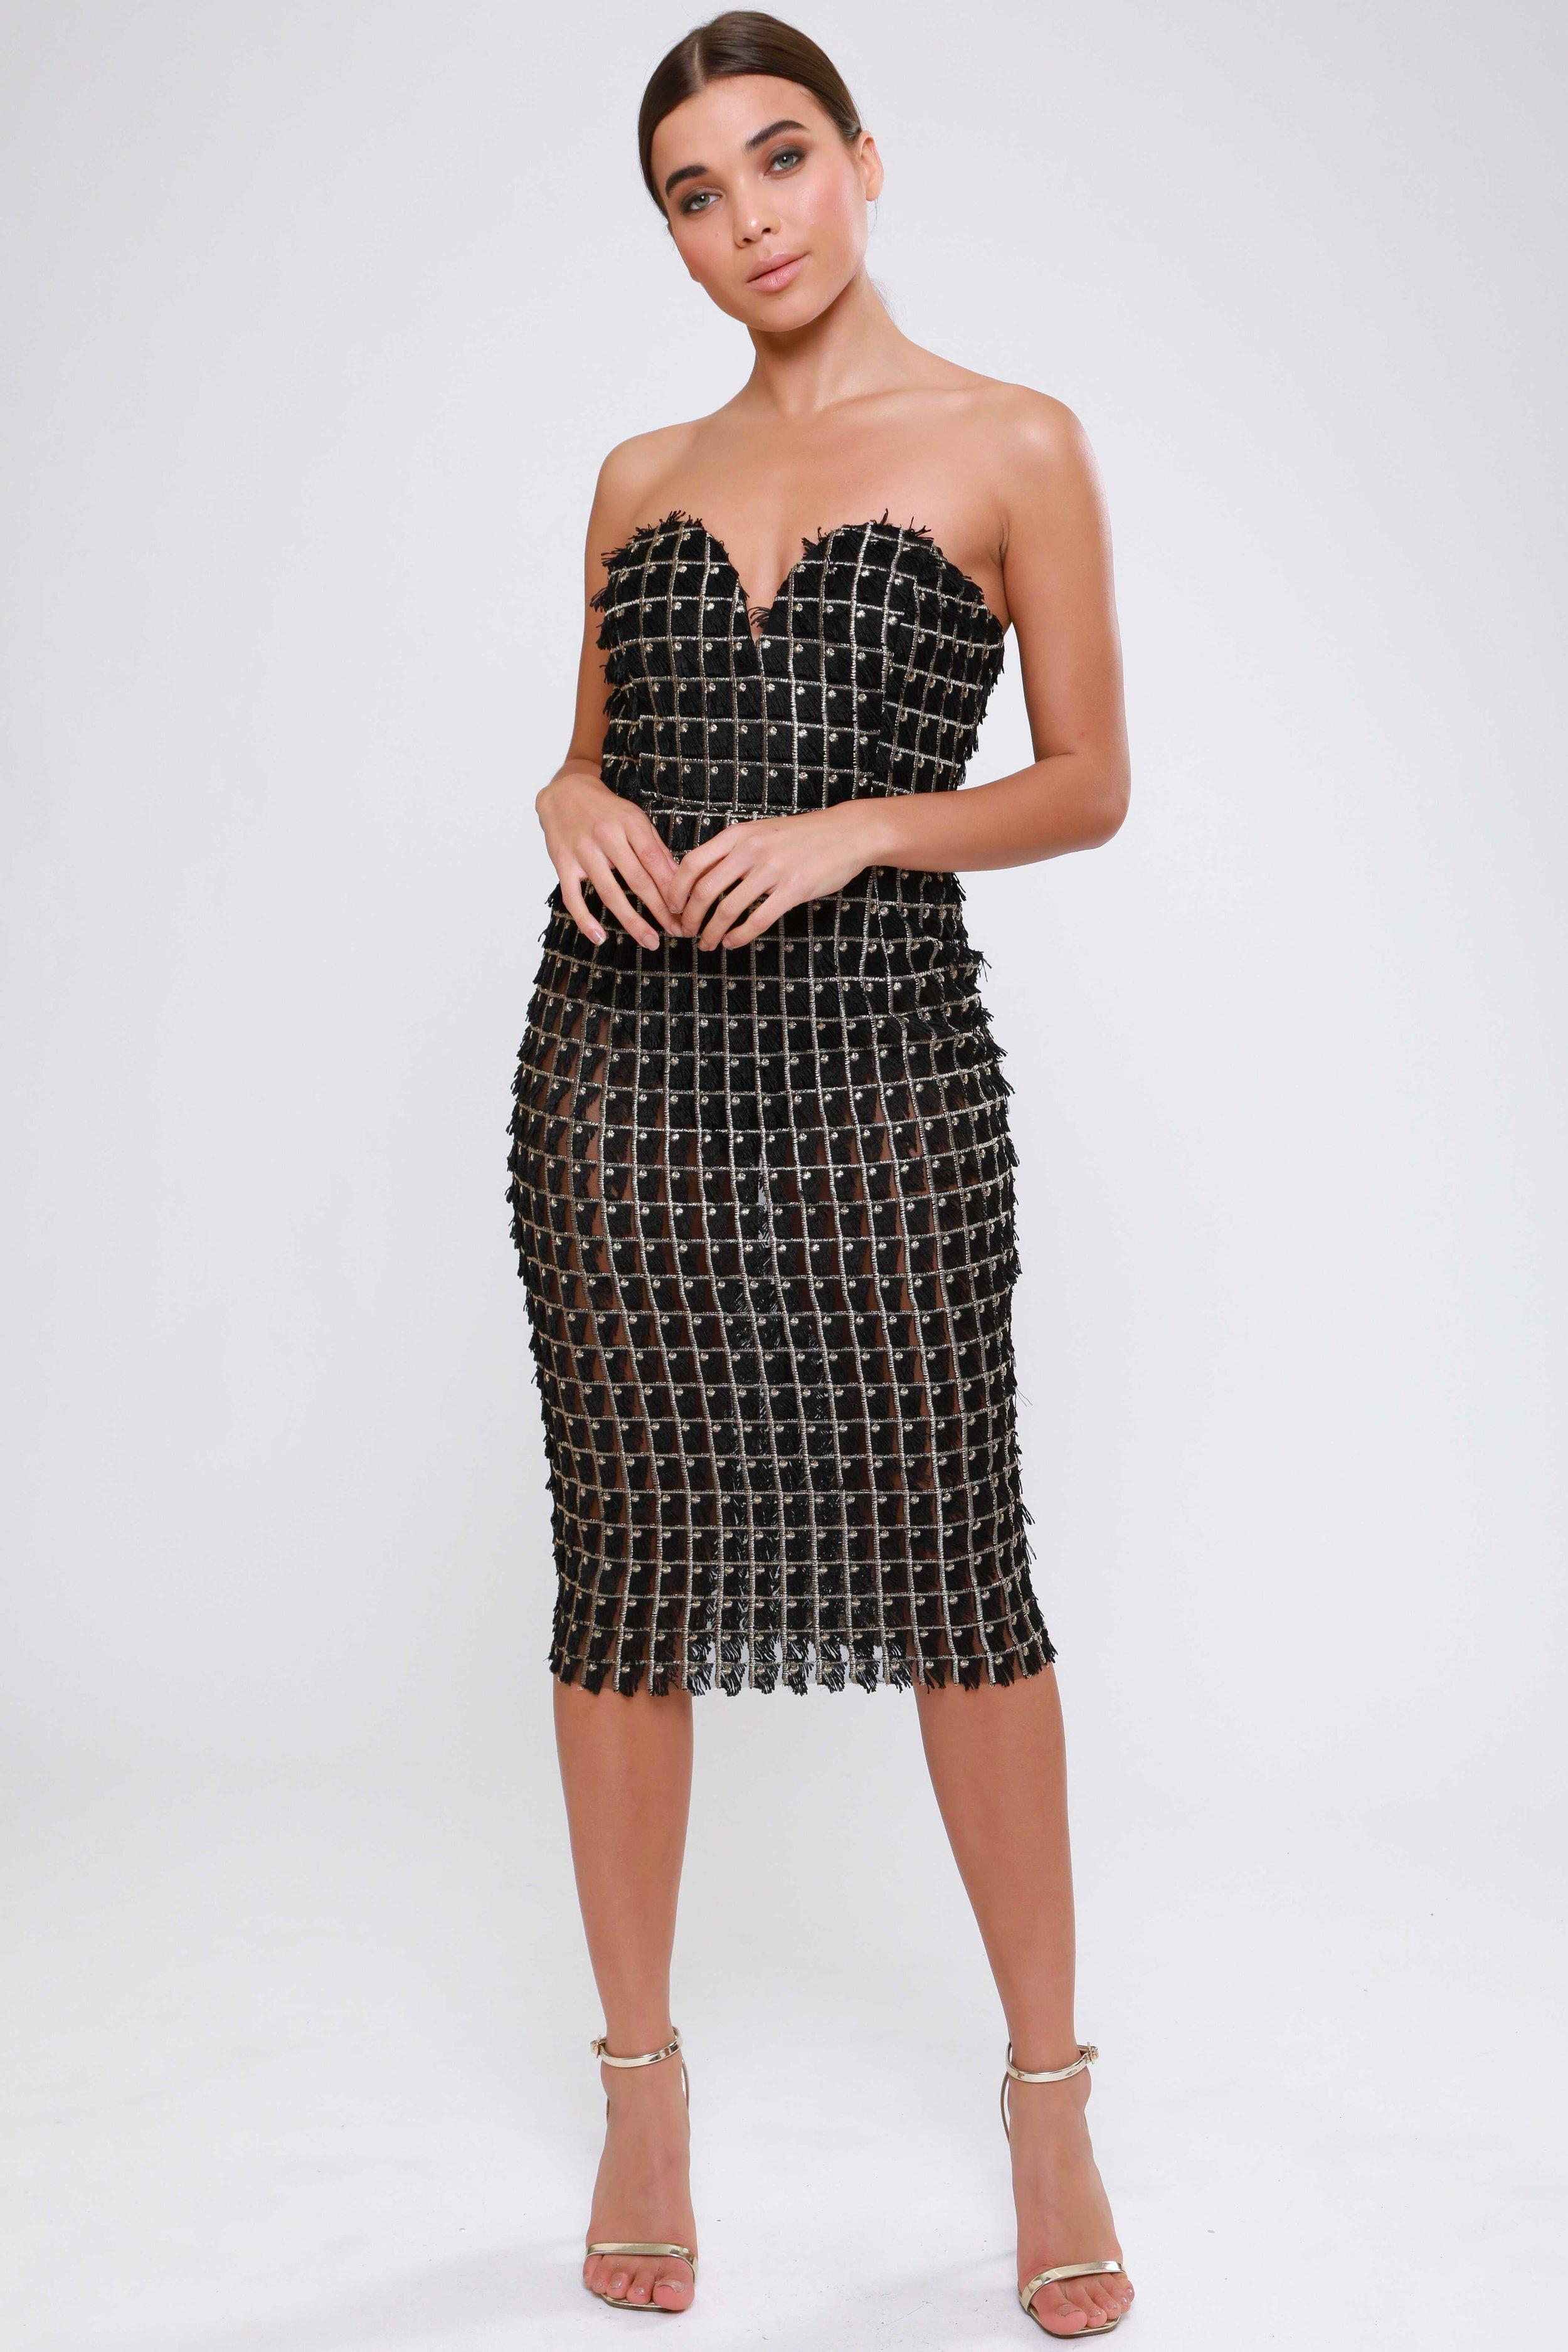 Textured Sweetheart  Midi Dress   £75.00